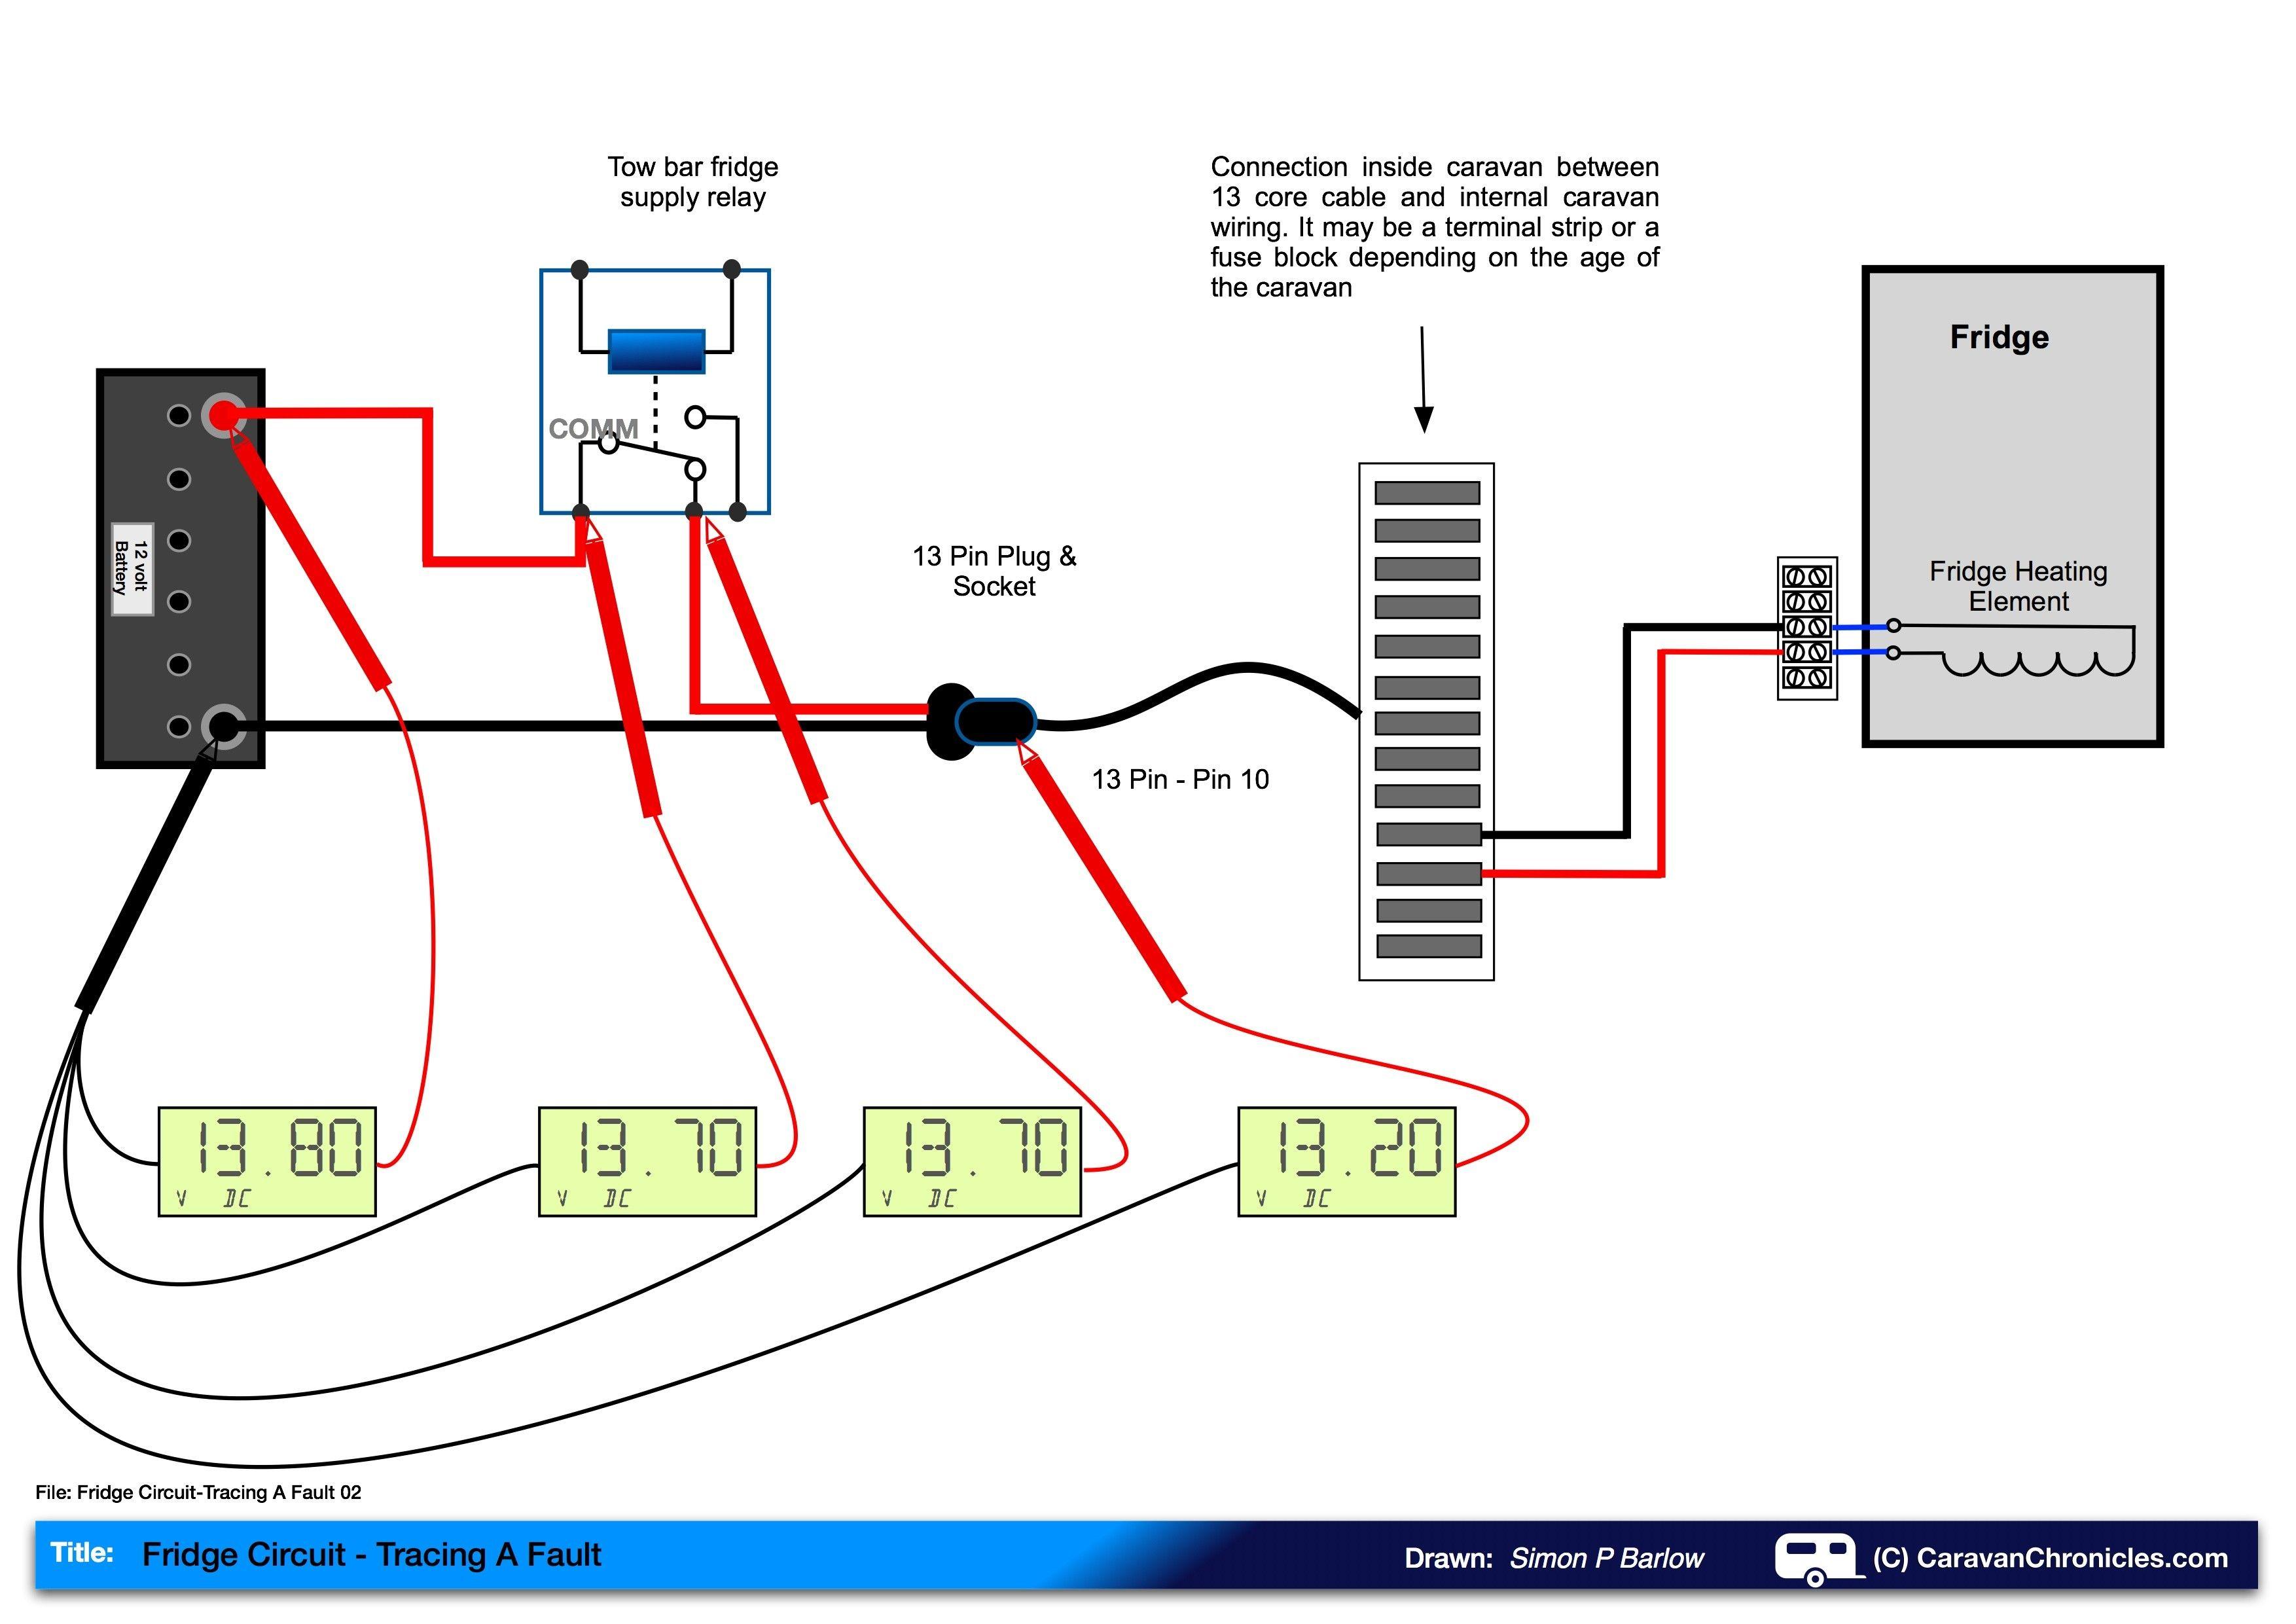 New Wiring Diagram towbar Electrics Caravan